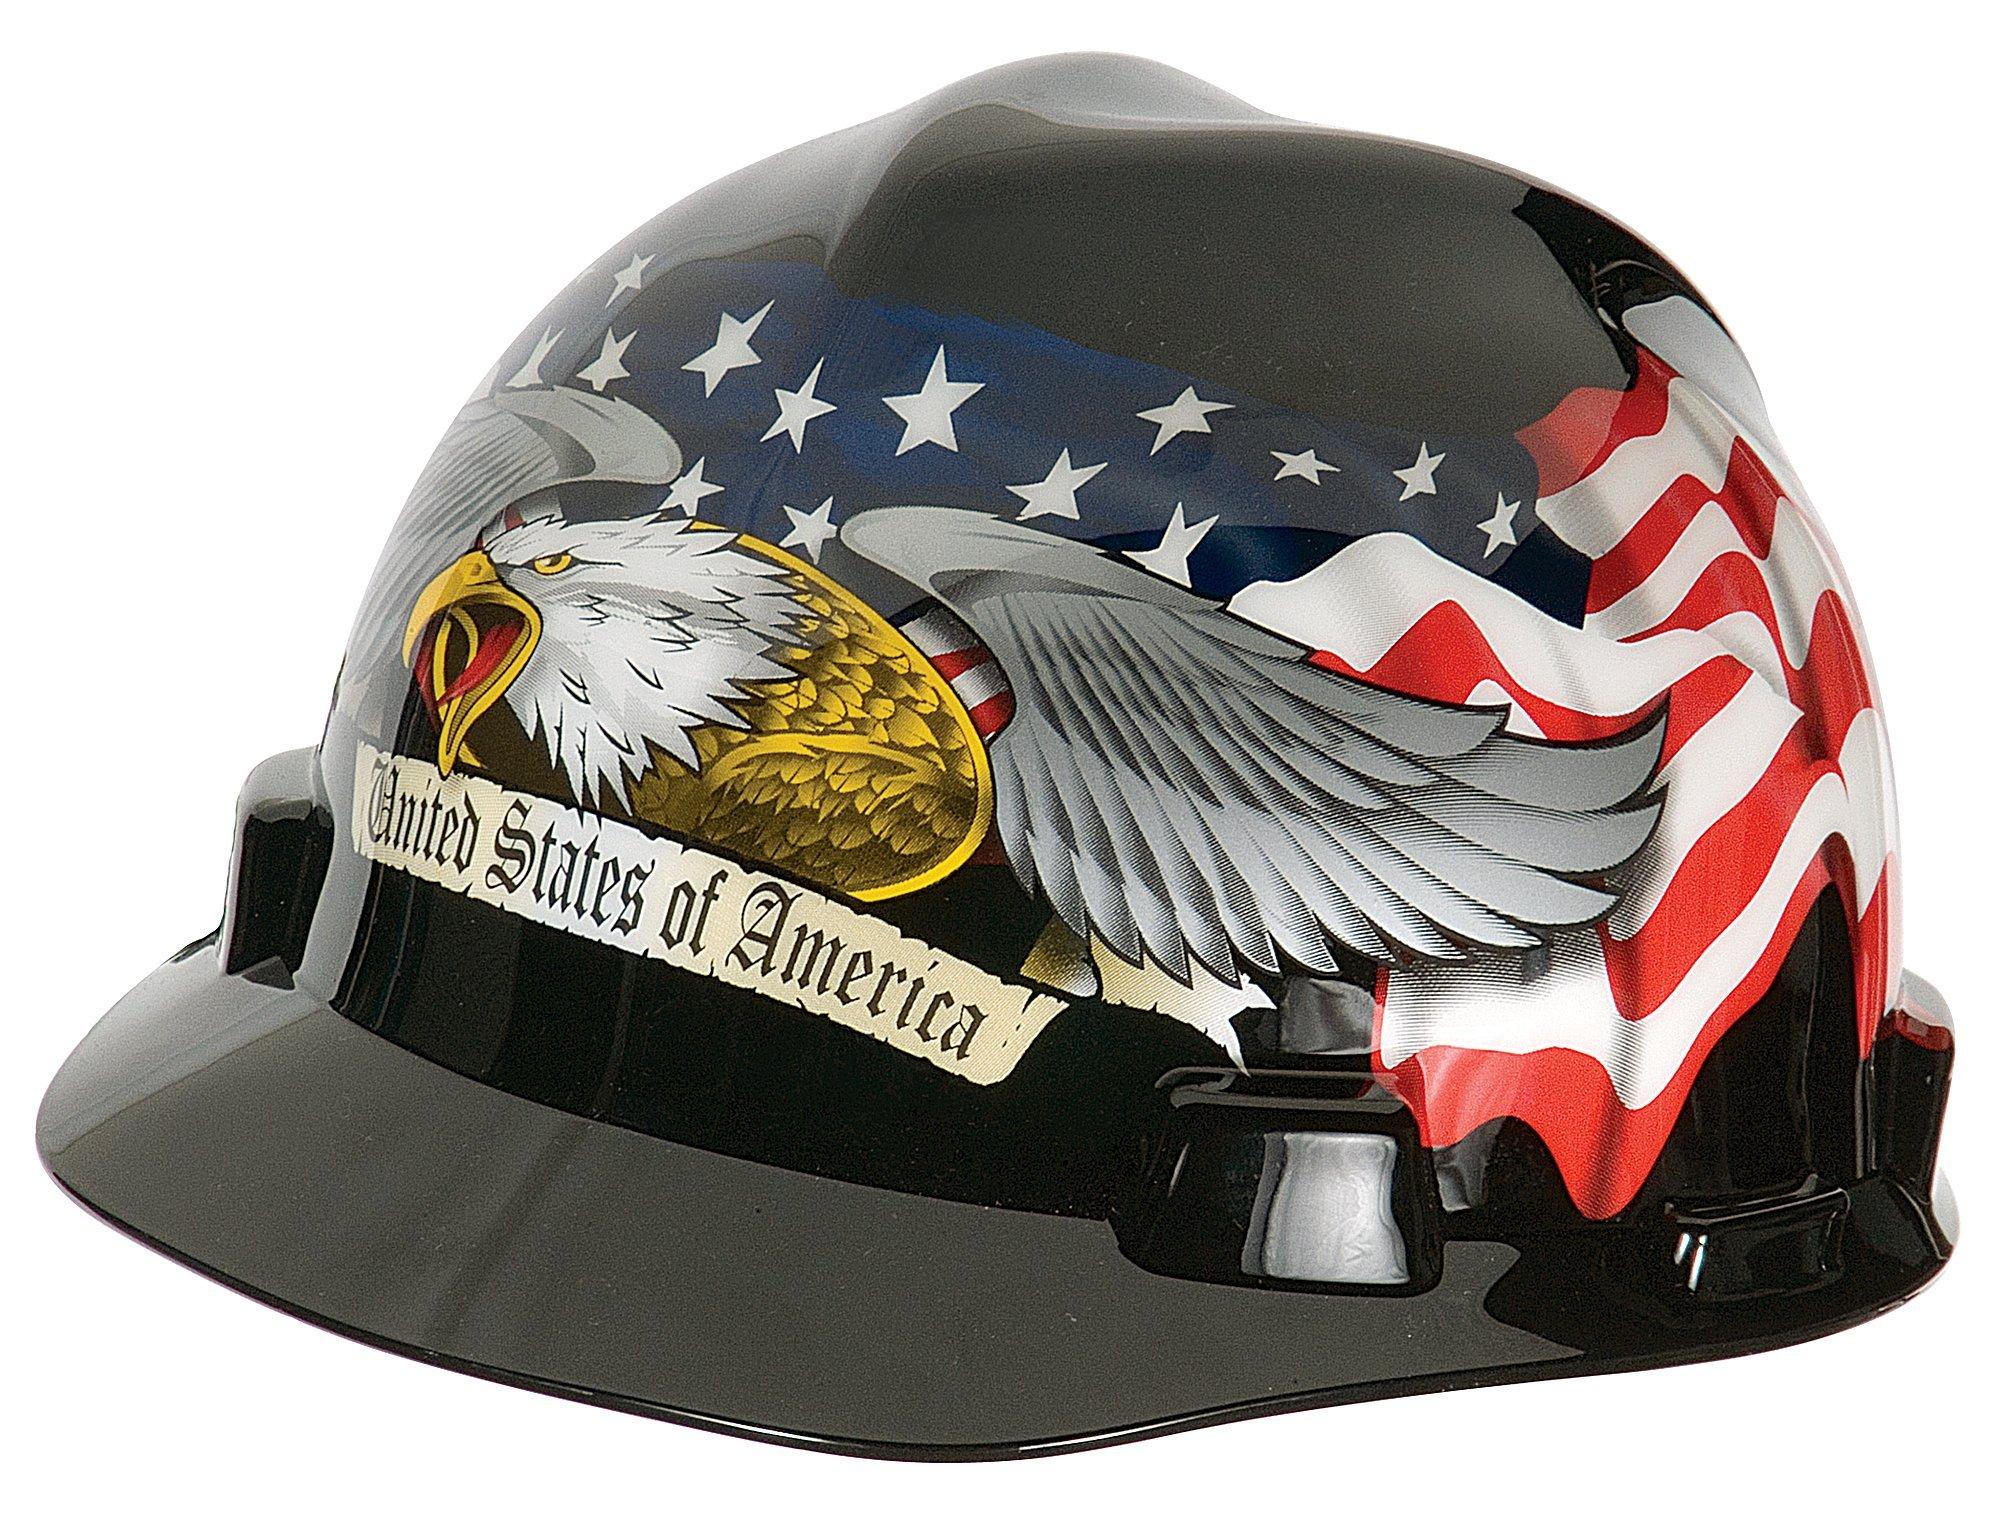 MSA 10079479 V-Gard Hard Hat Front Brim with Ratchet Suspension, Standard, American Eagle by MSA (Image #2)